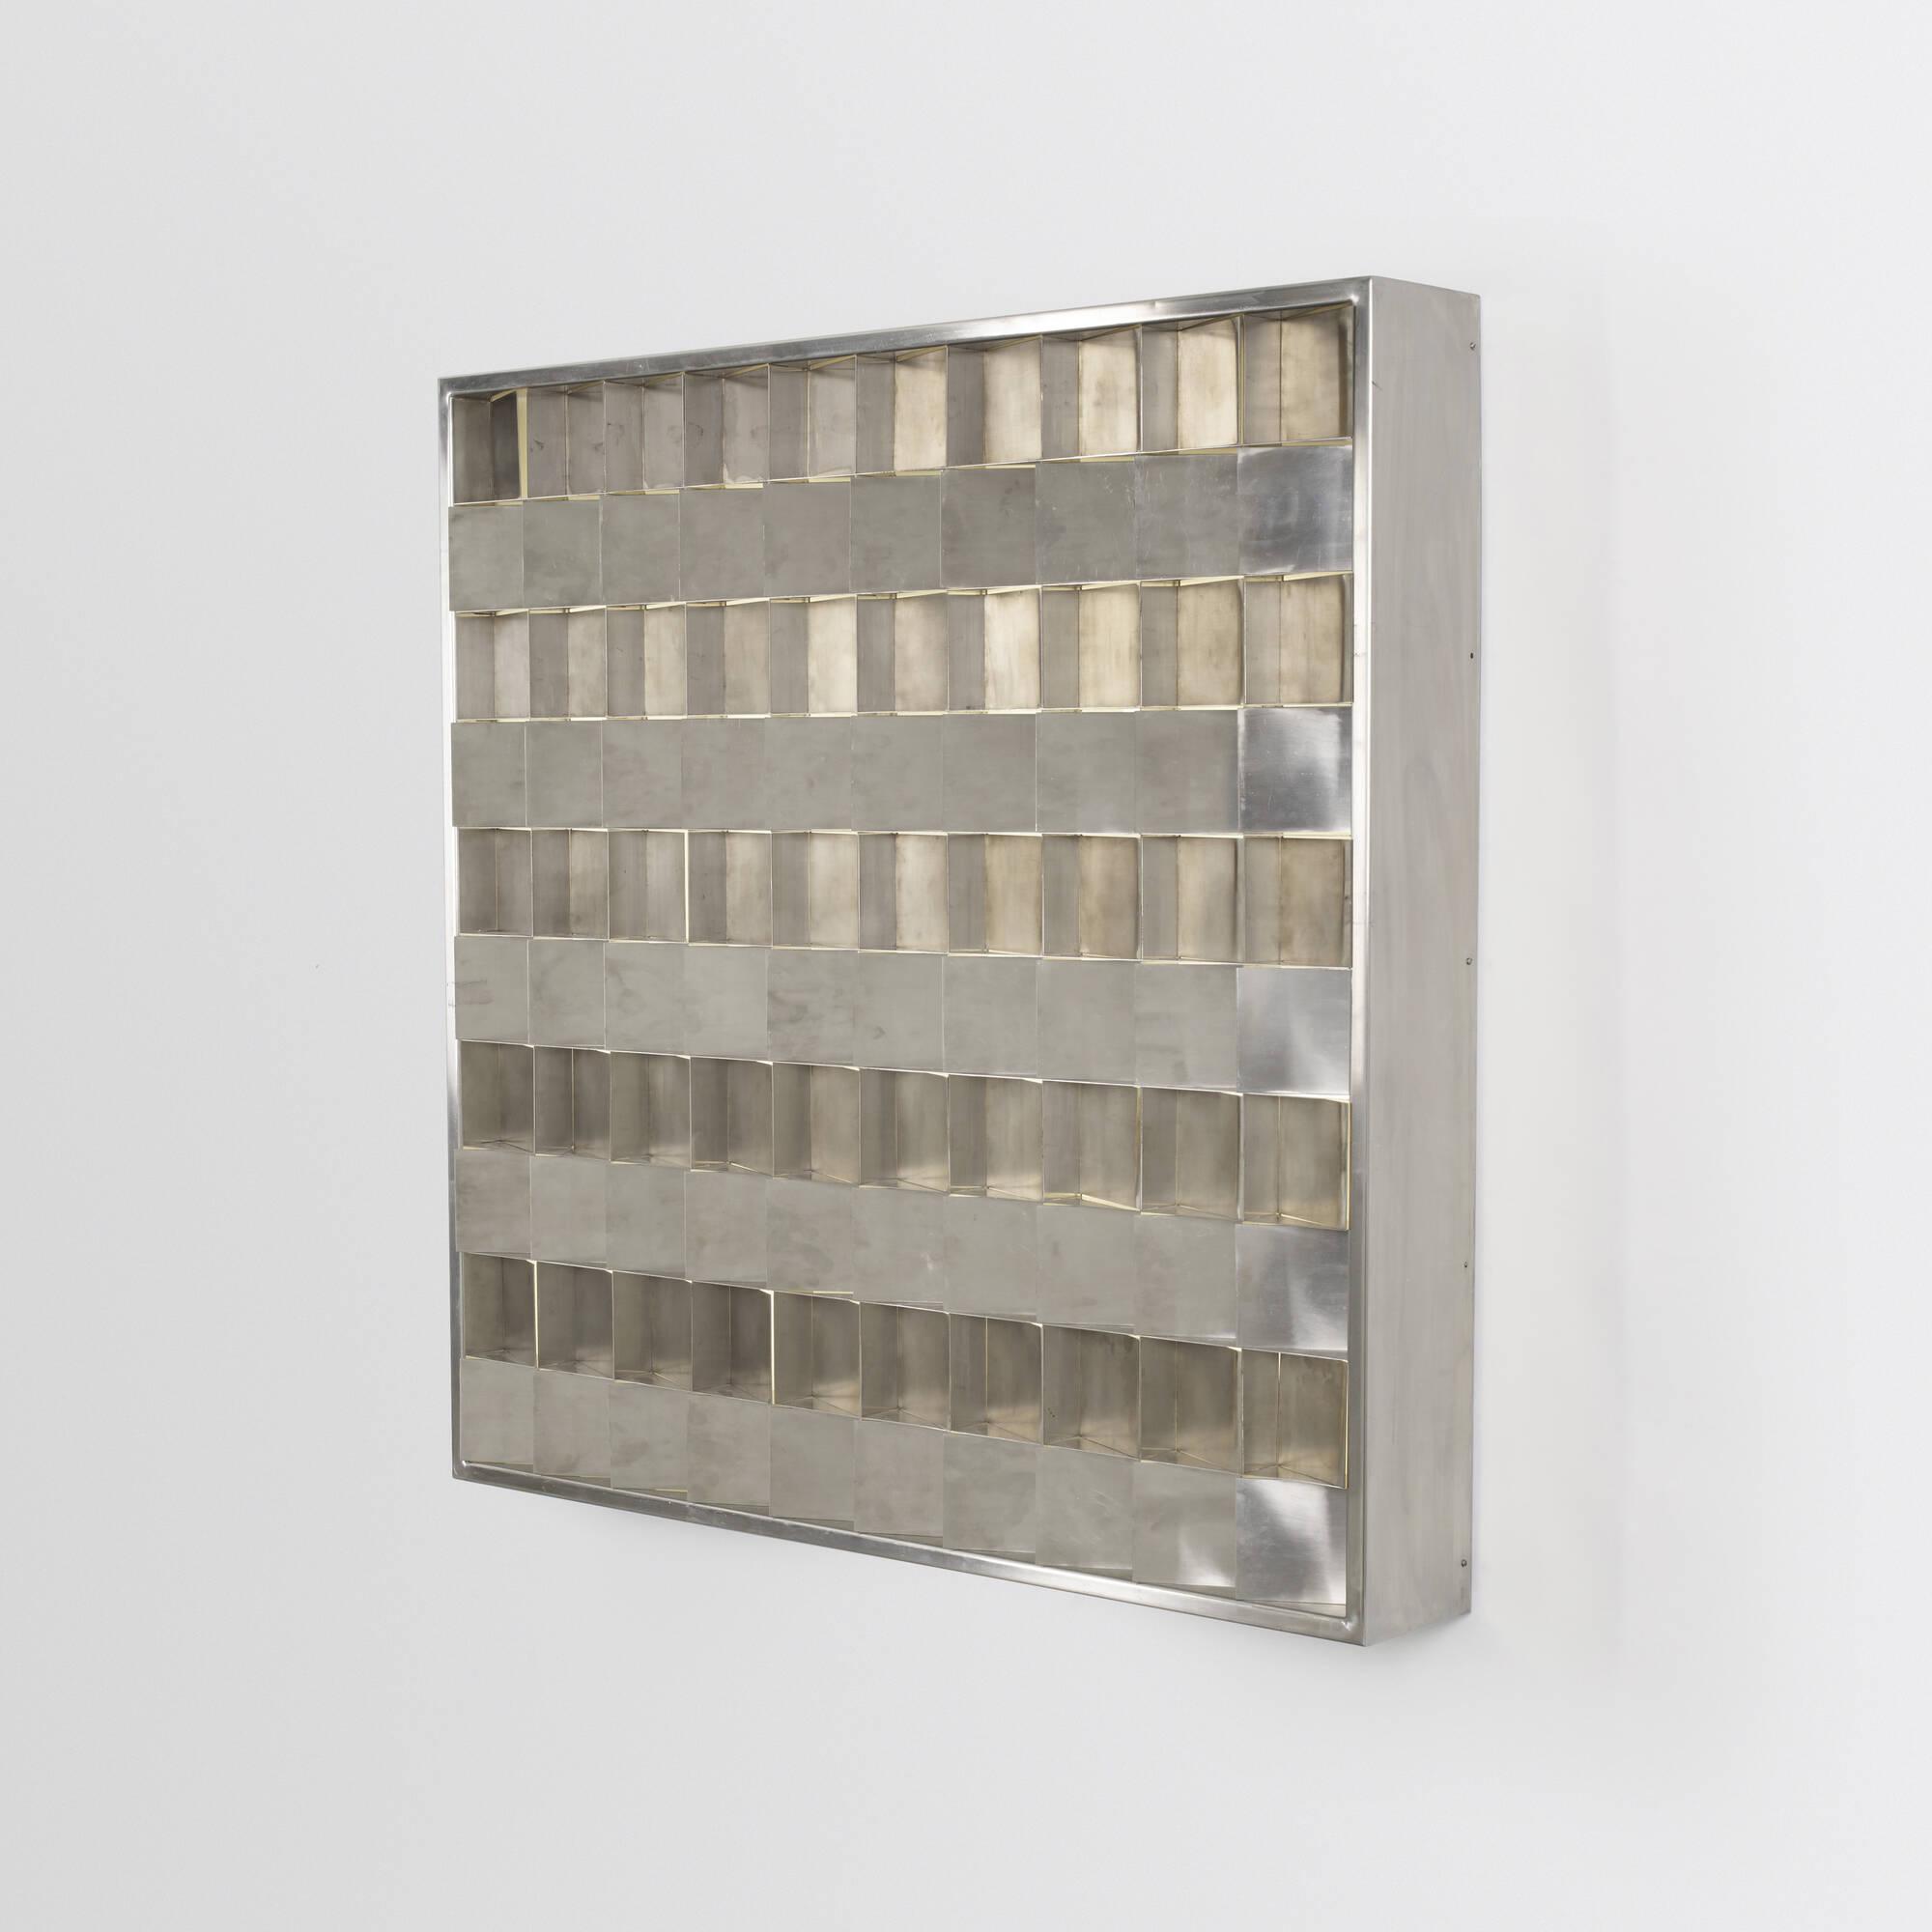 11: Gianfranco Fini / Programma wall light (2 of 3)